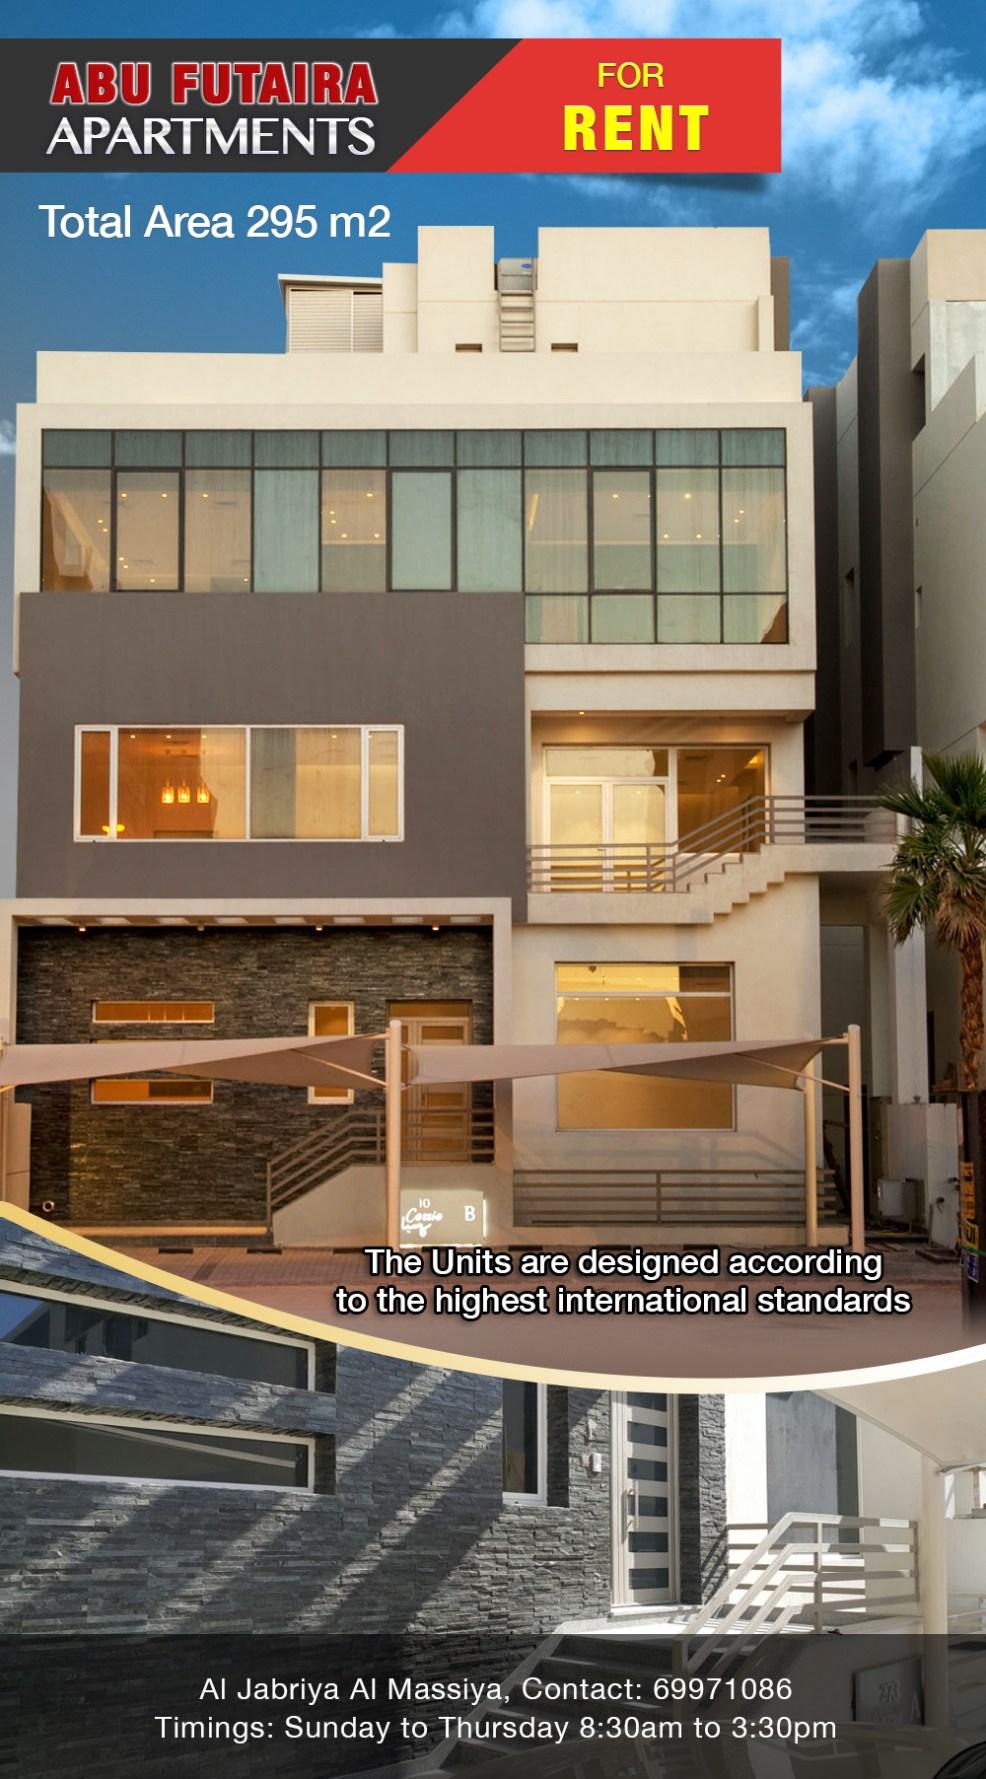 Abu Futaira Apartments